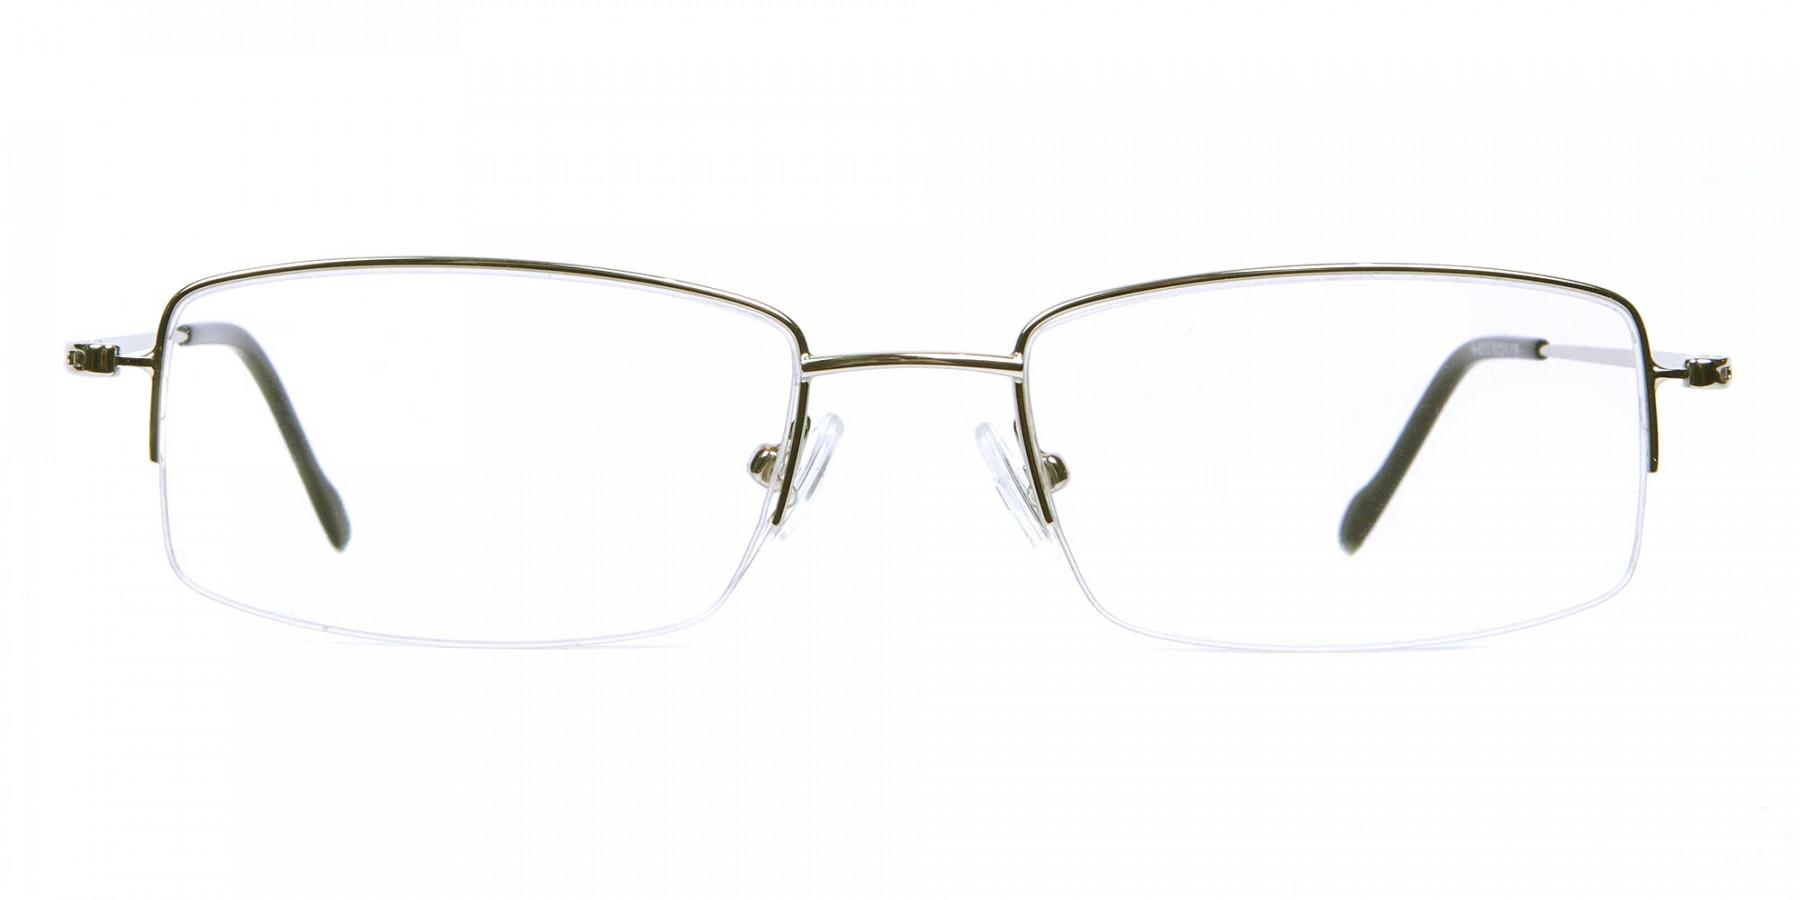 Silver Half-Rim Rectangular Glasses- 1